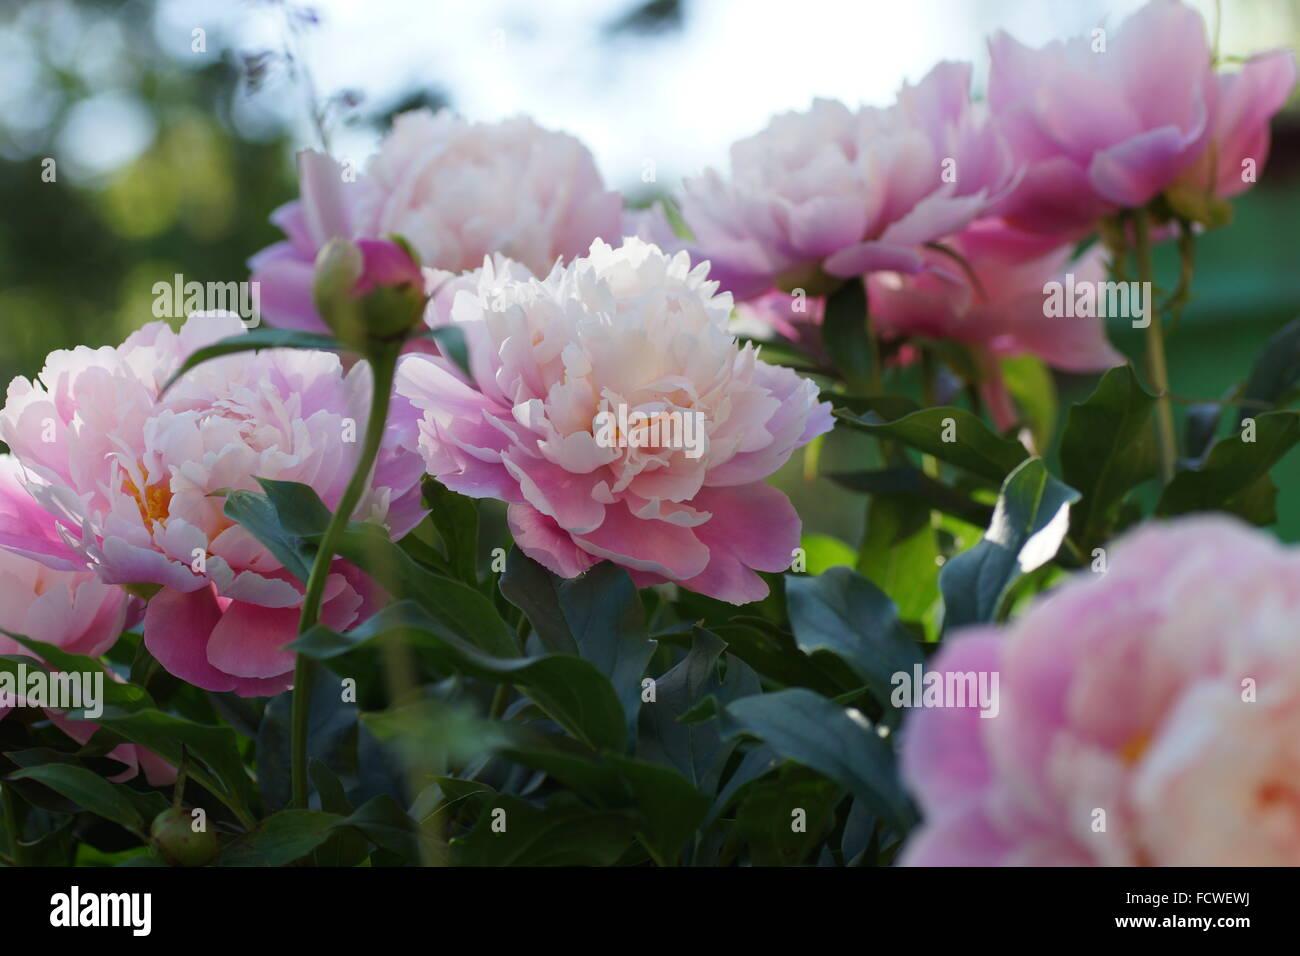 Double pink peony flowers beautiful pink peony flowers stock double pink peony flowers beautiful pink peony flowers dhlflorist Images